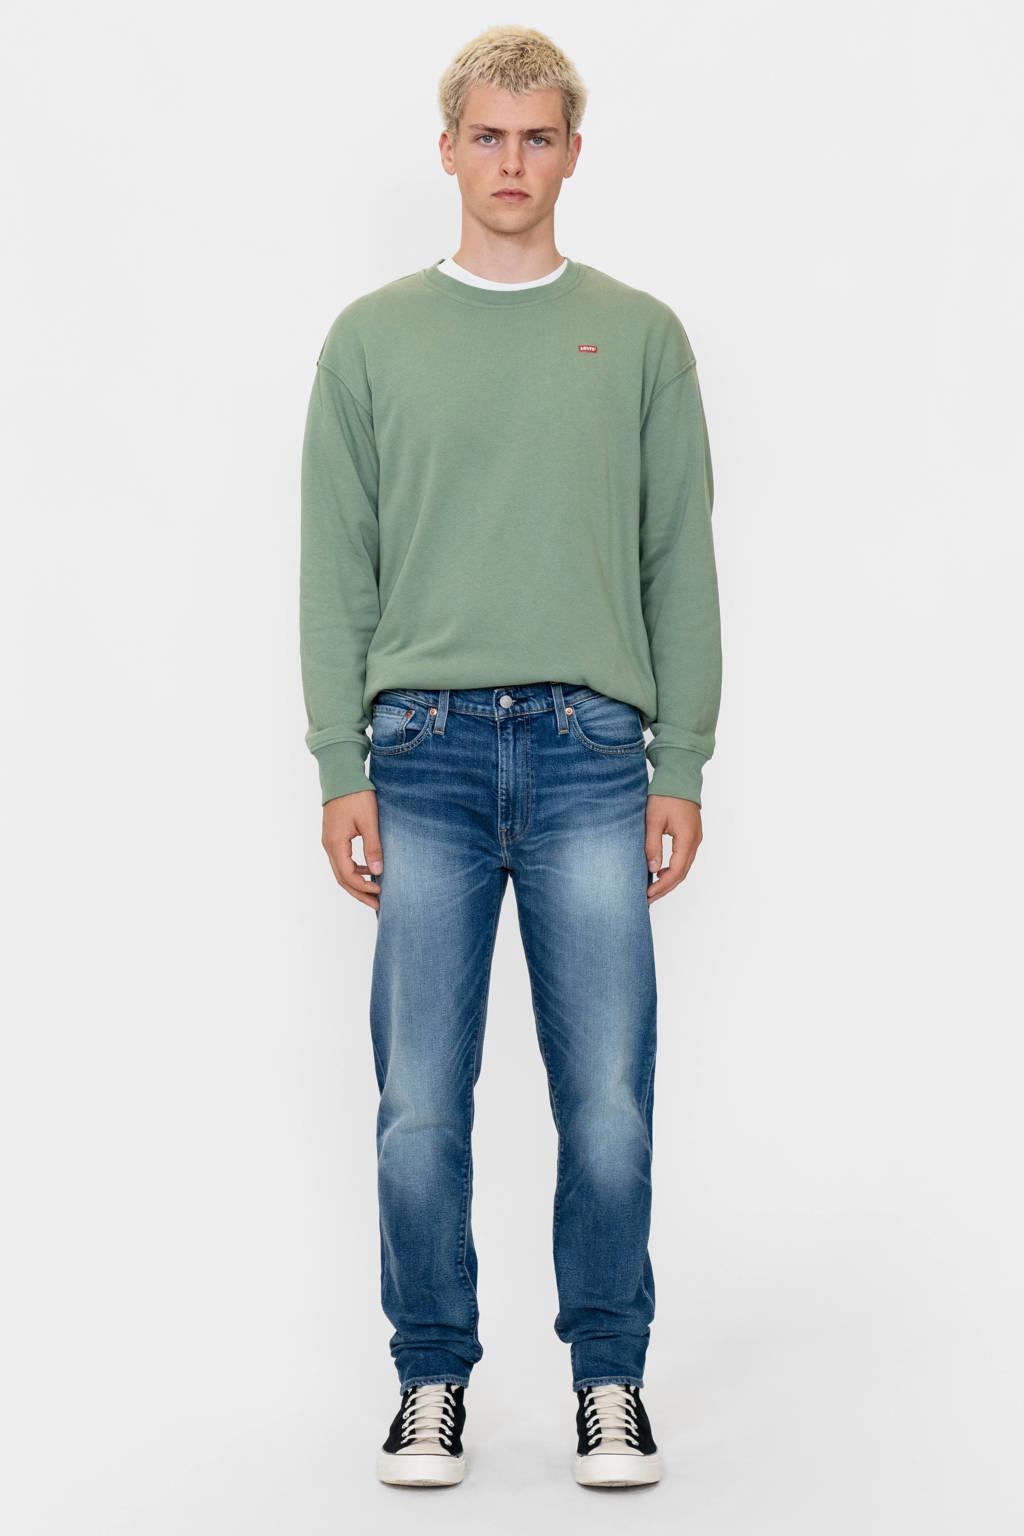 Levi's 512 slim fit jeans play everyday adv, Play everyday adv